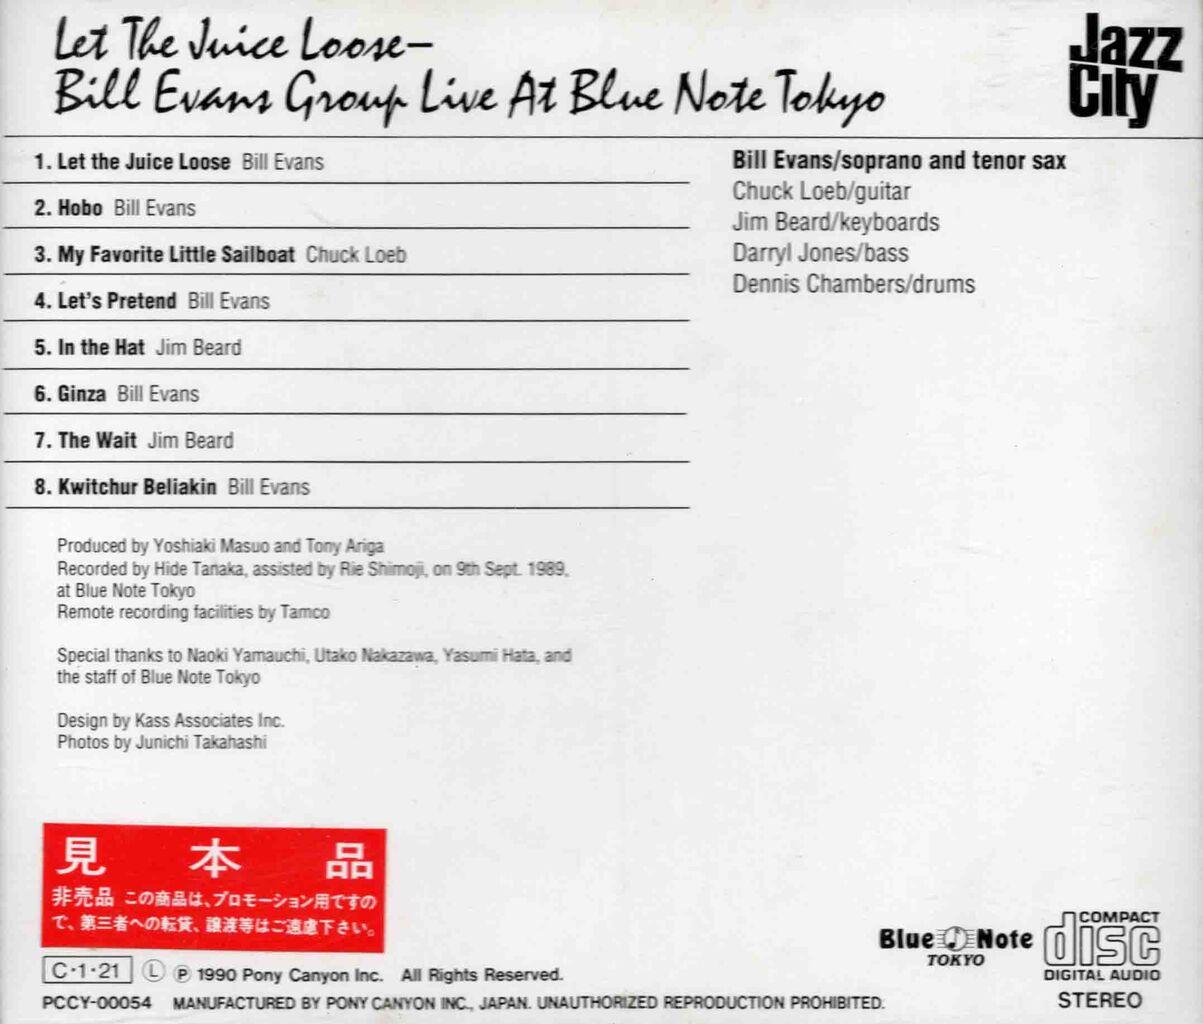 LET THE JUICE LOOSE〜BILL EVANS GROUP LIVE AT BLUE NOTE TOKYO-2